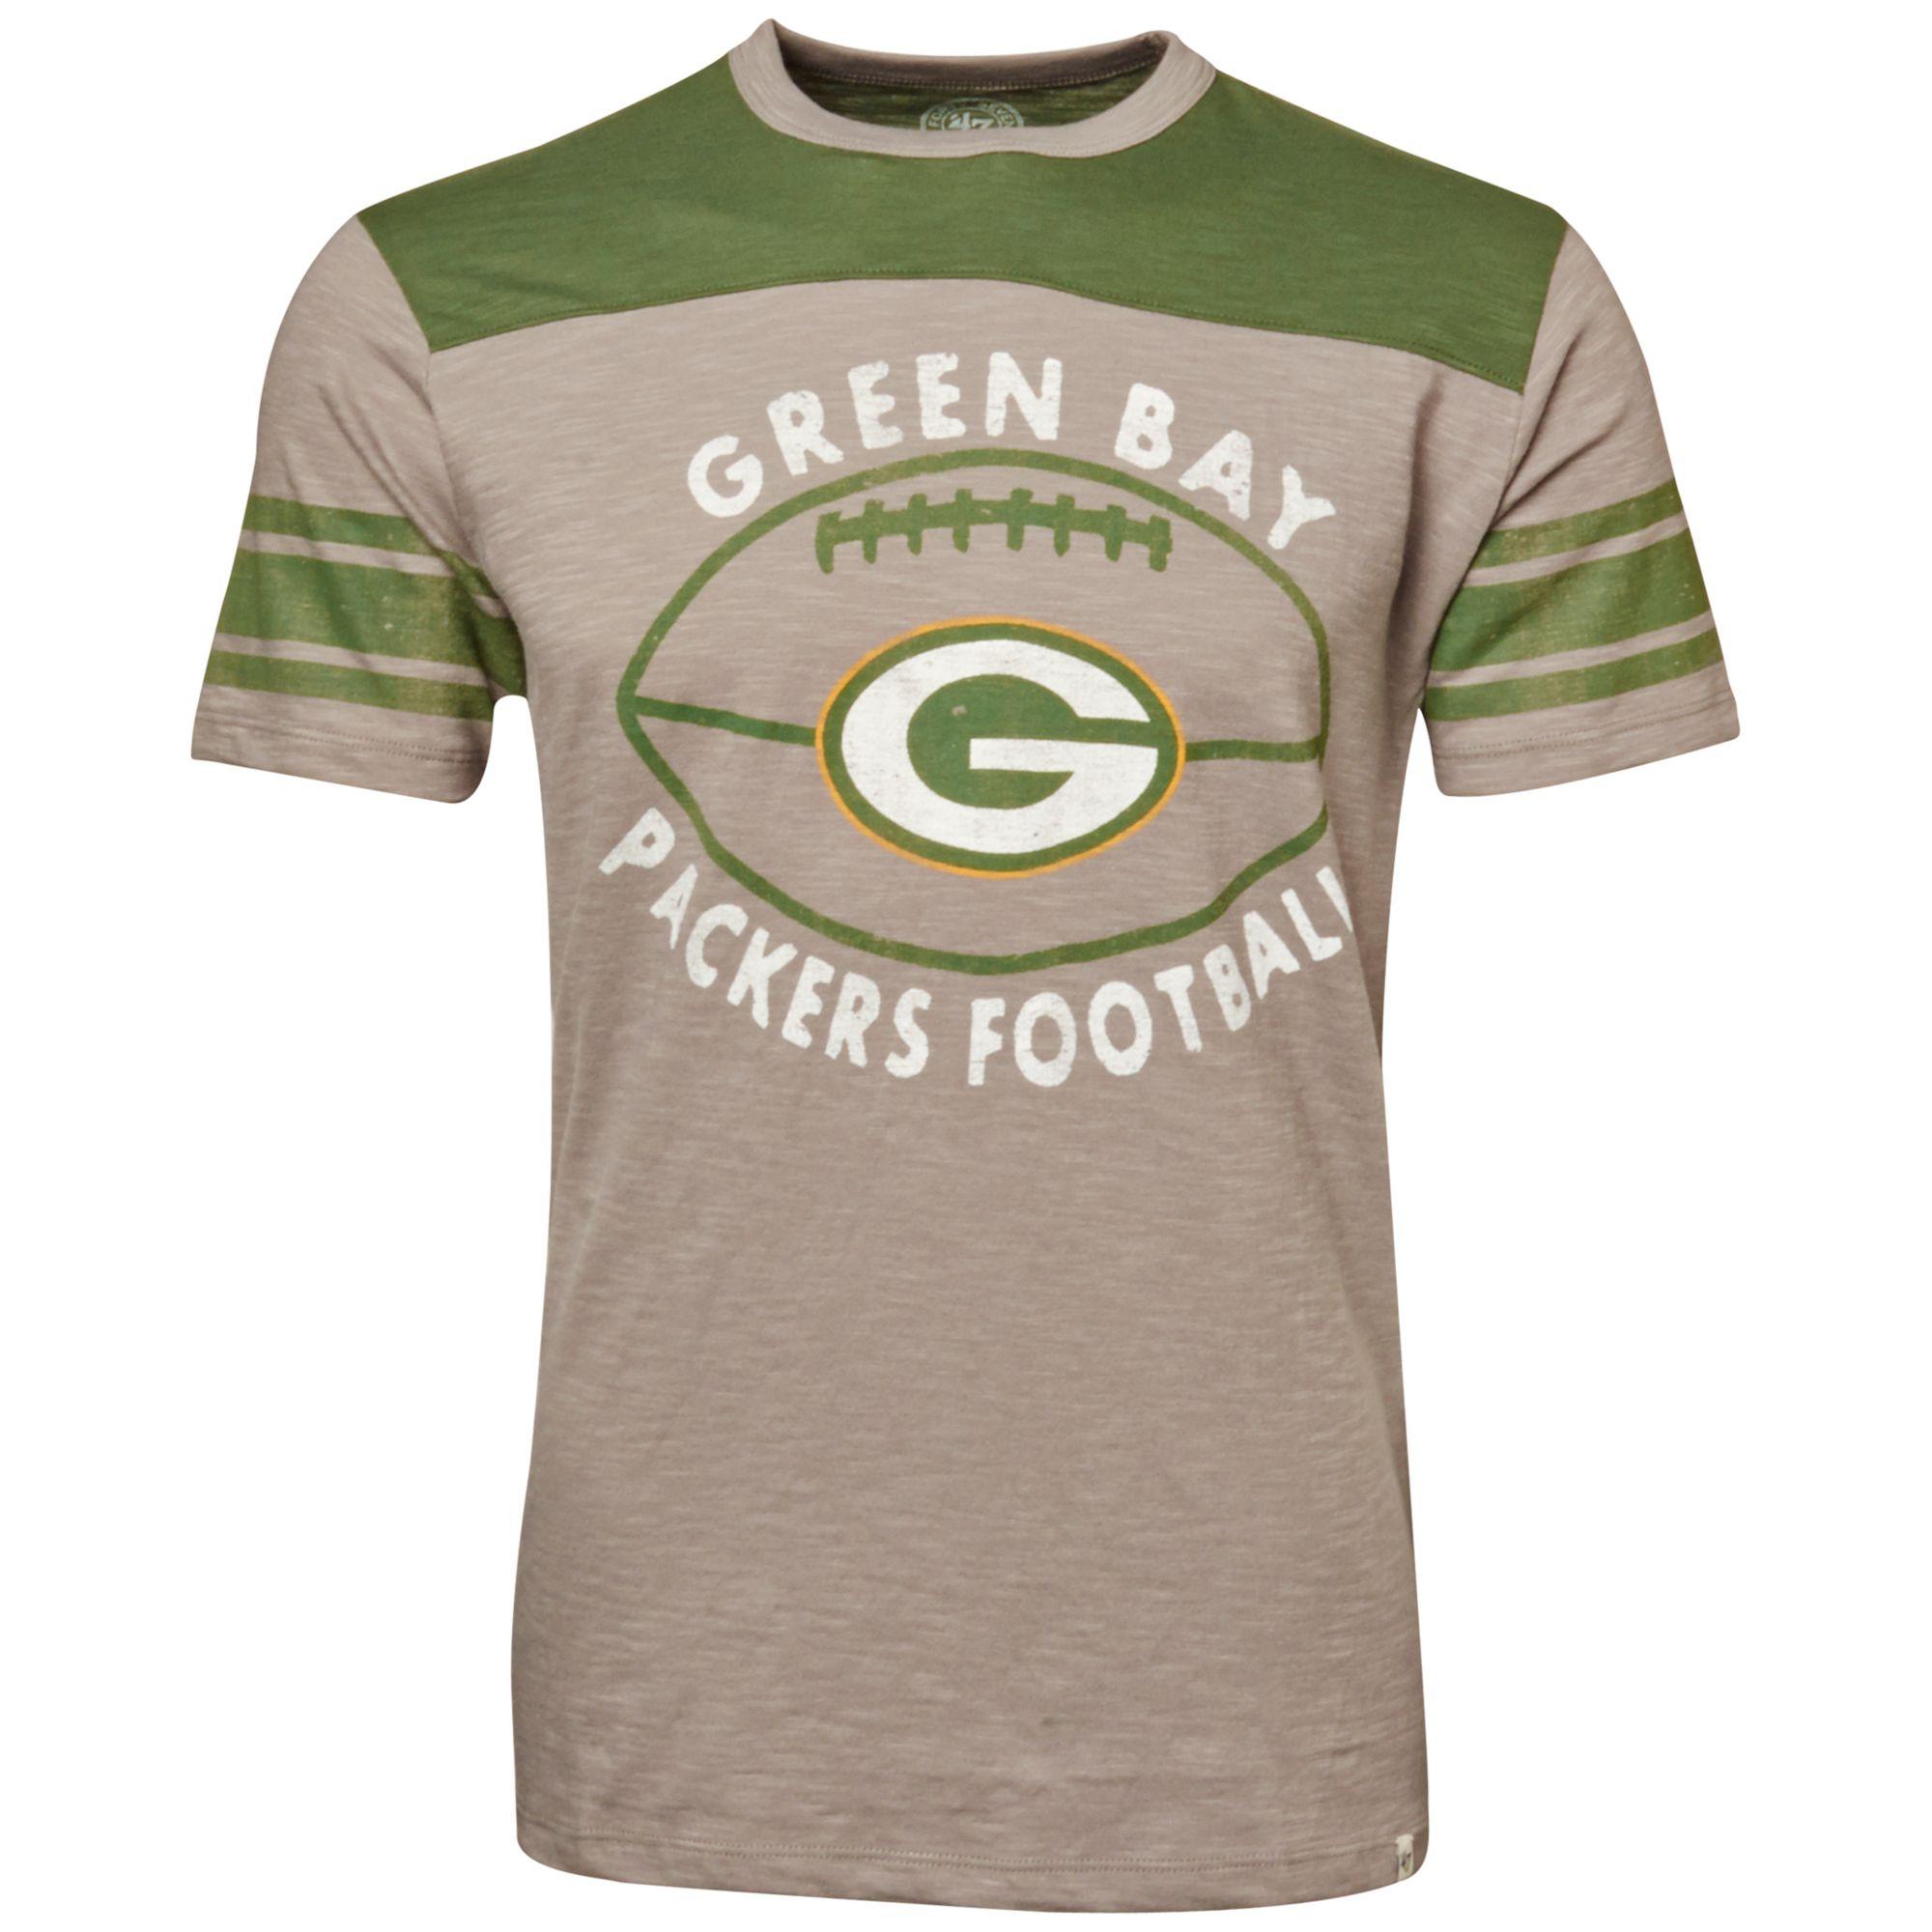 93bda58f3 Lyst - 47 Brand Mens Green Bay Packers Top Gun Tshirt in Gray for Men